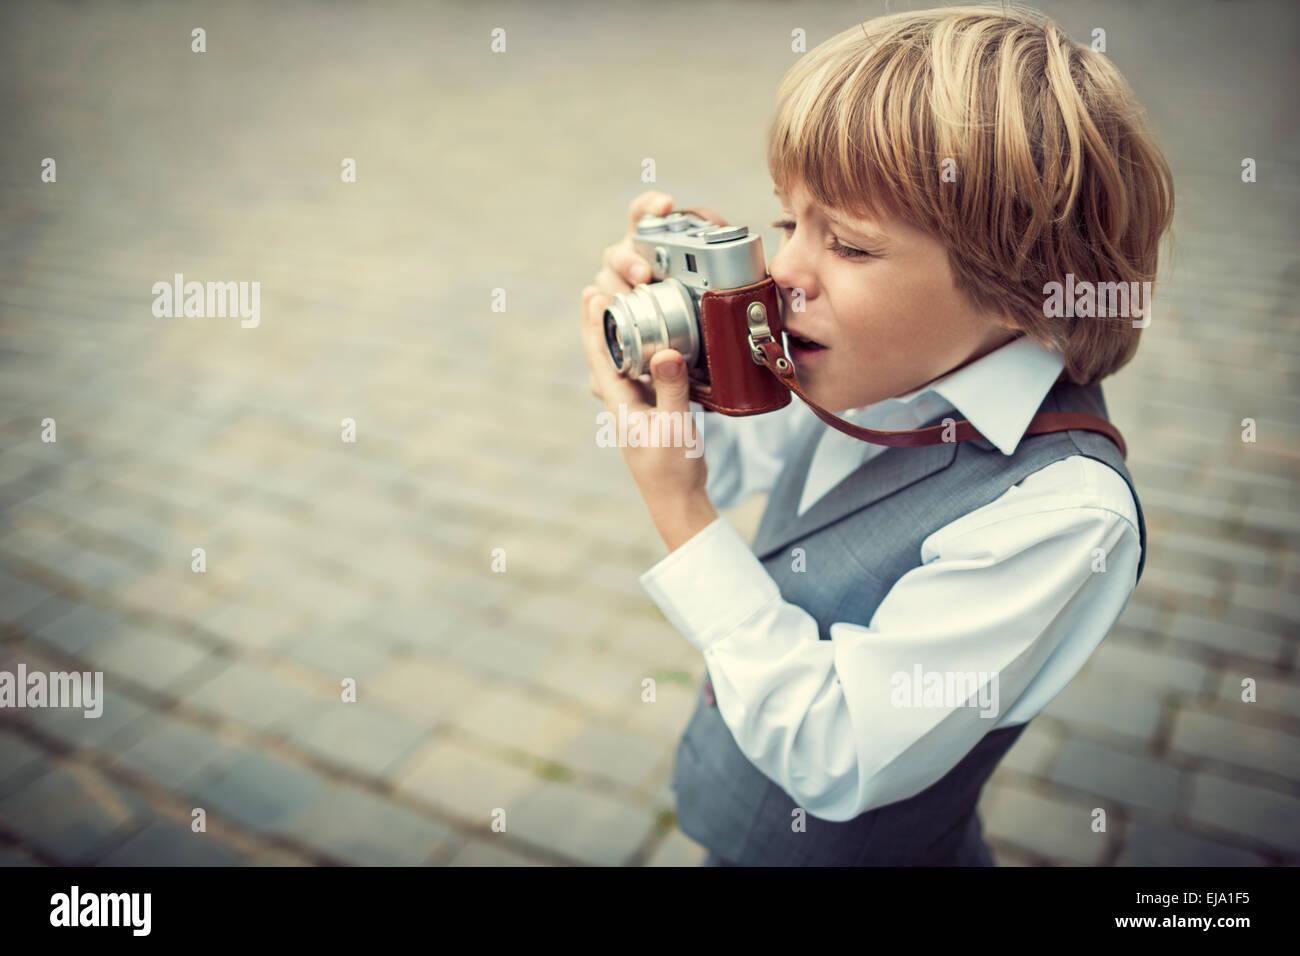 Loisirs Photo Stock